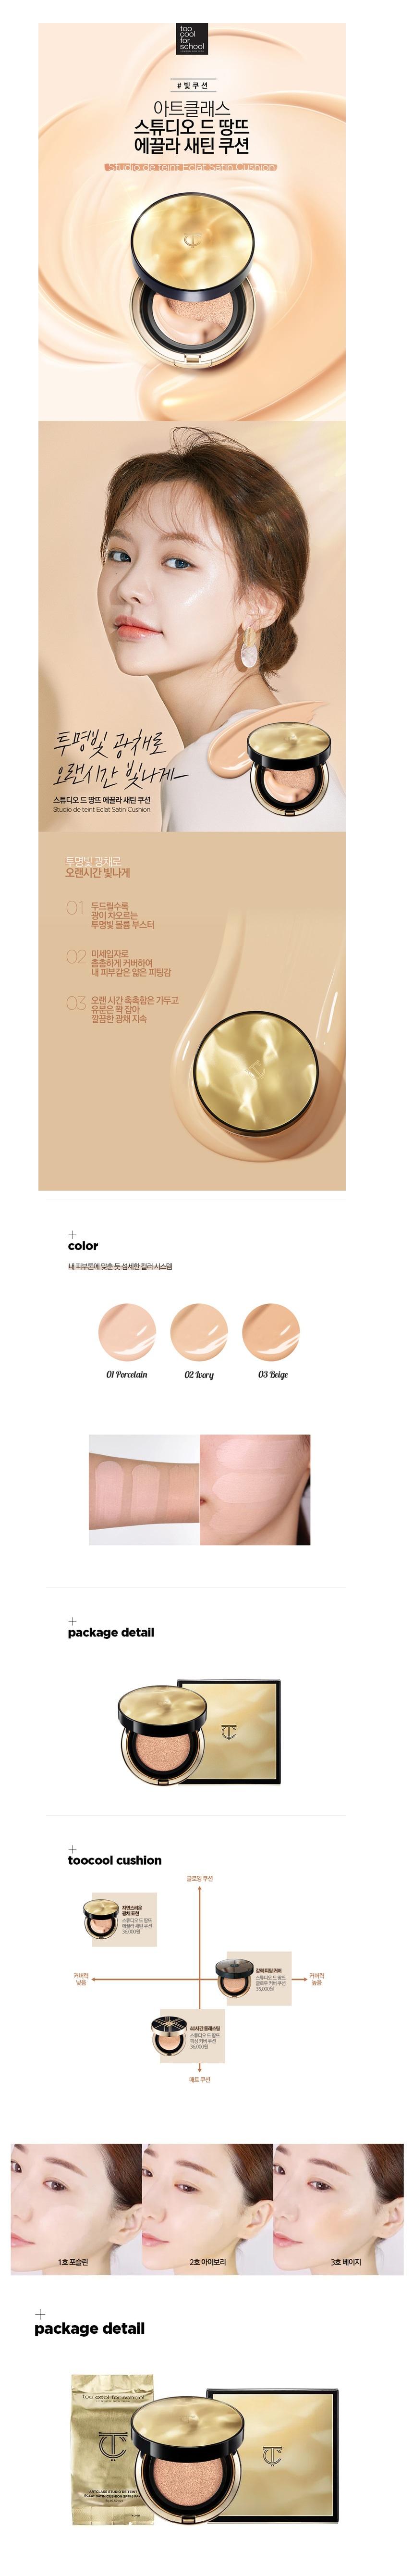 too cool for school Studio De Teint Eclat Satin Cushion korean makeup product online shop malaysia China macau singapore1